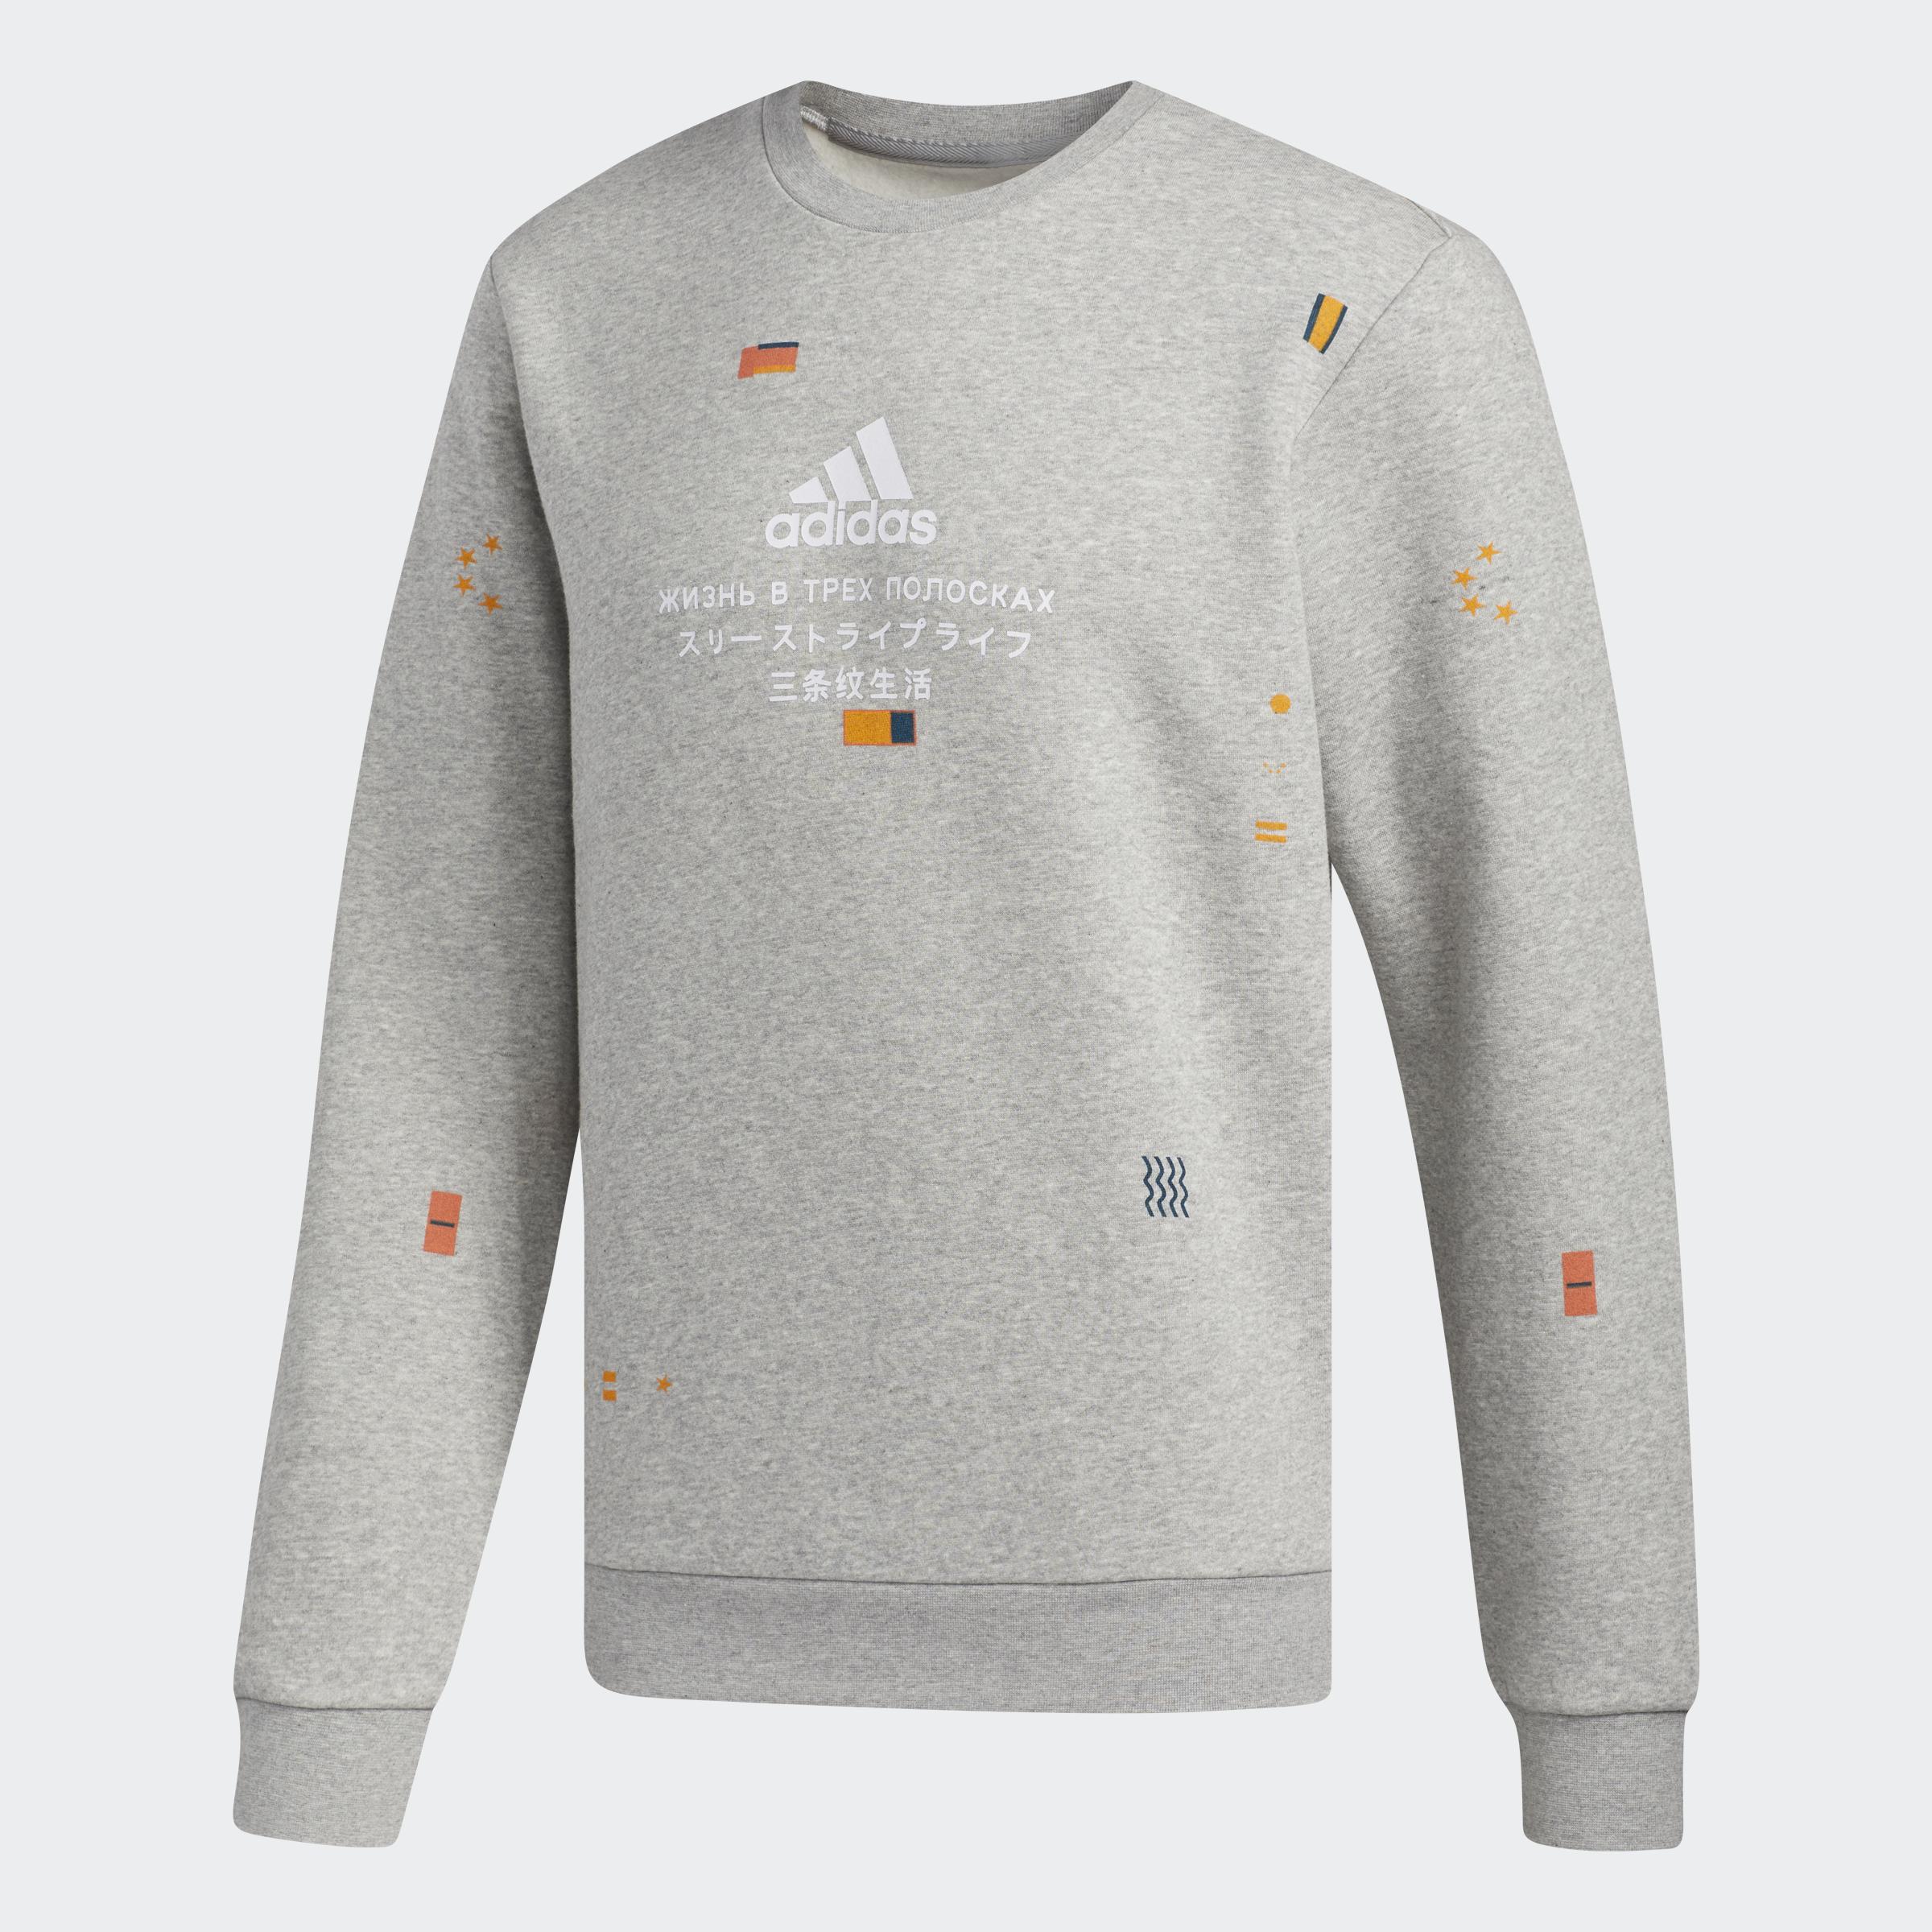 thumbnail 10 - adidas Global Citizens Crew Sweatshirt Men's Sweatshirts